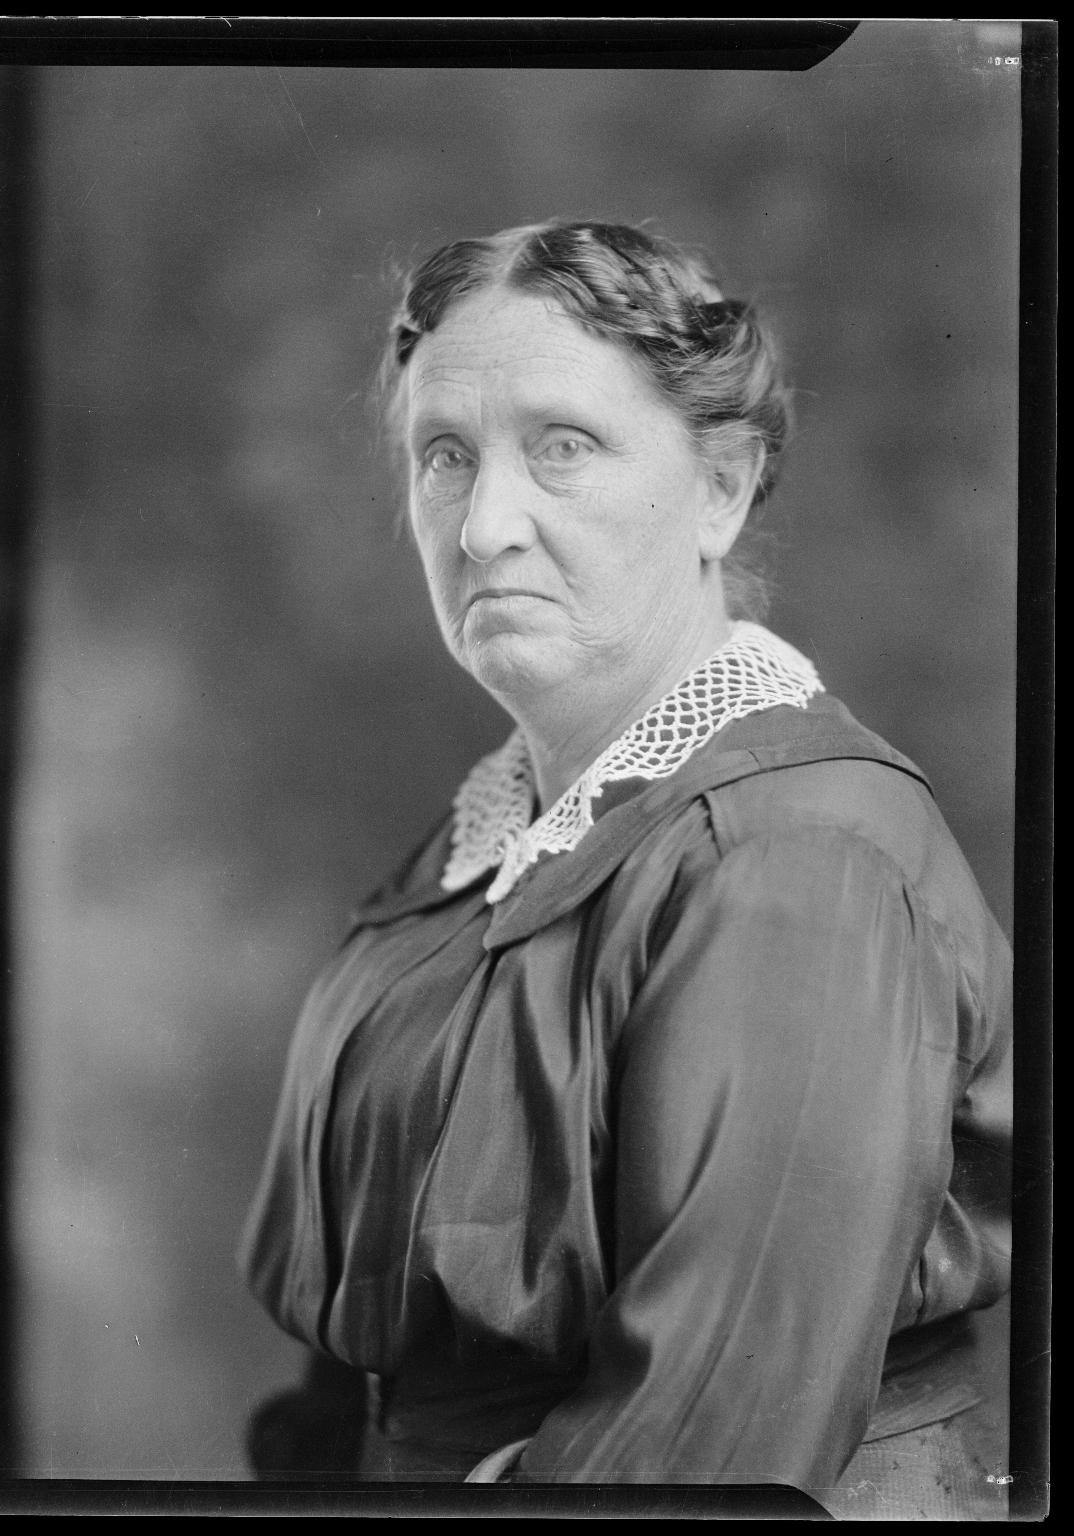 Portraits of Mrs. E. L. Mintz